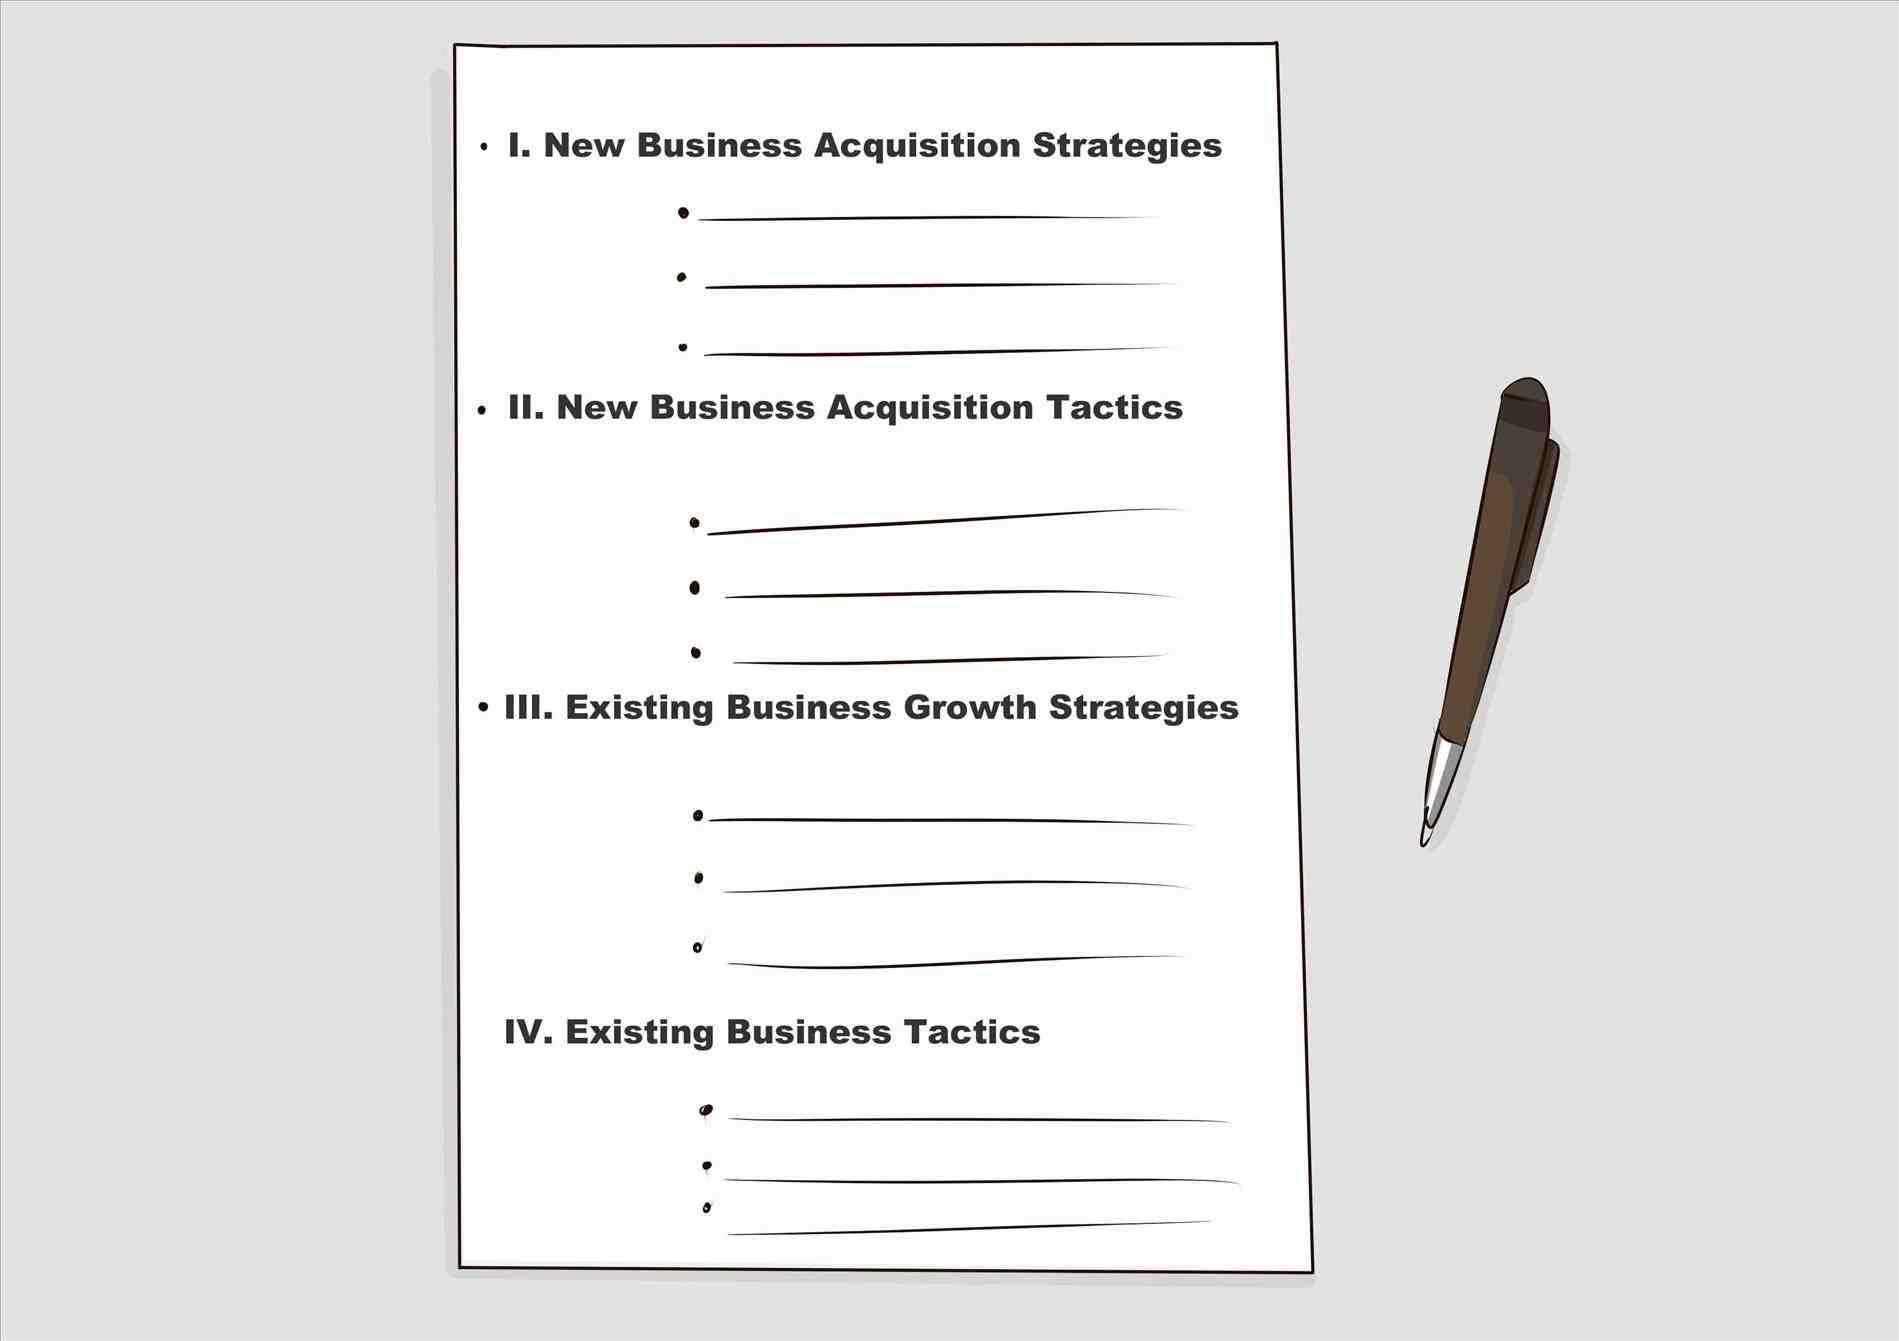 best Top 4 Resources To Get Free Sales Plan Templates of free marketing plan template templates designrhauxpaysdesfleurscom microsoft office smartsheetrhsmartsheetcom